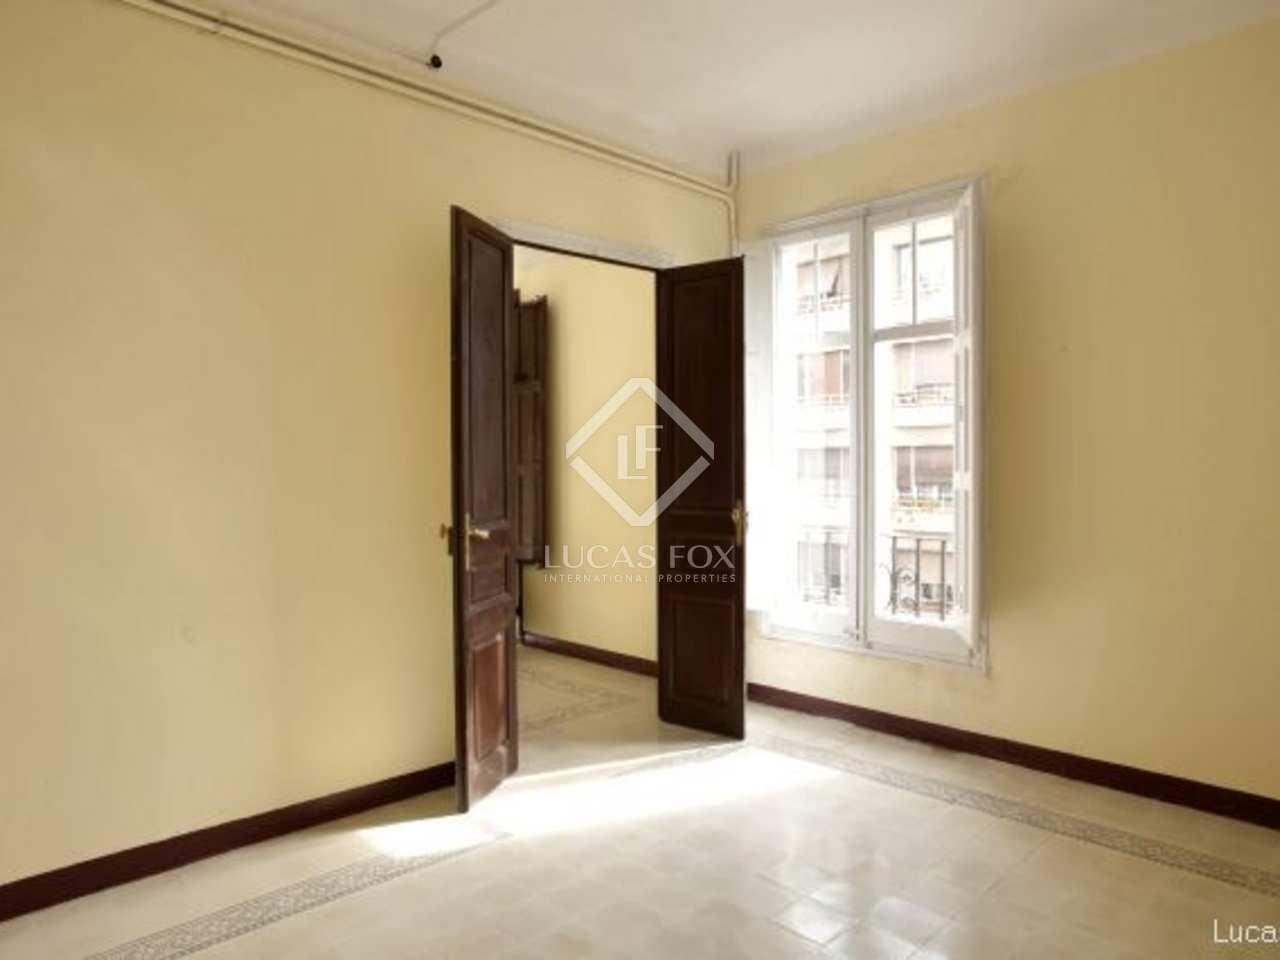 Apartment for sale on paseo san gervasi barcelona zona alta - Zona alta barcelona ...